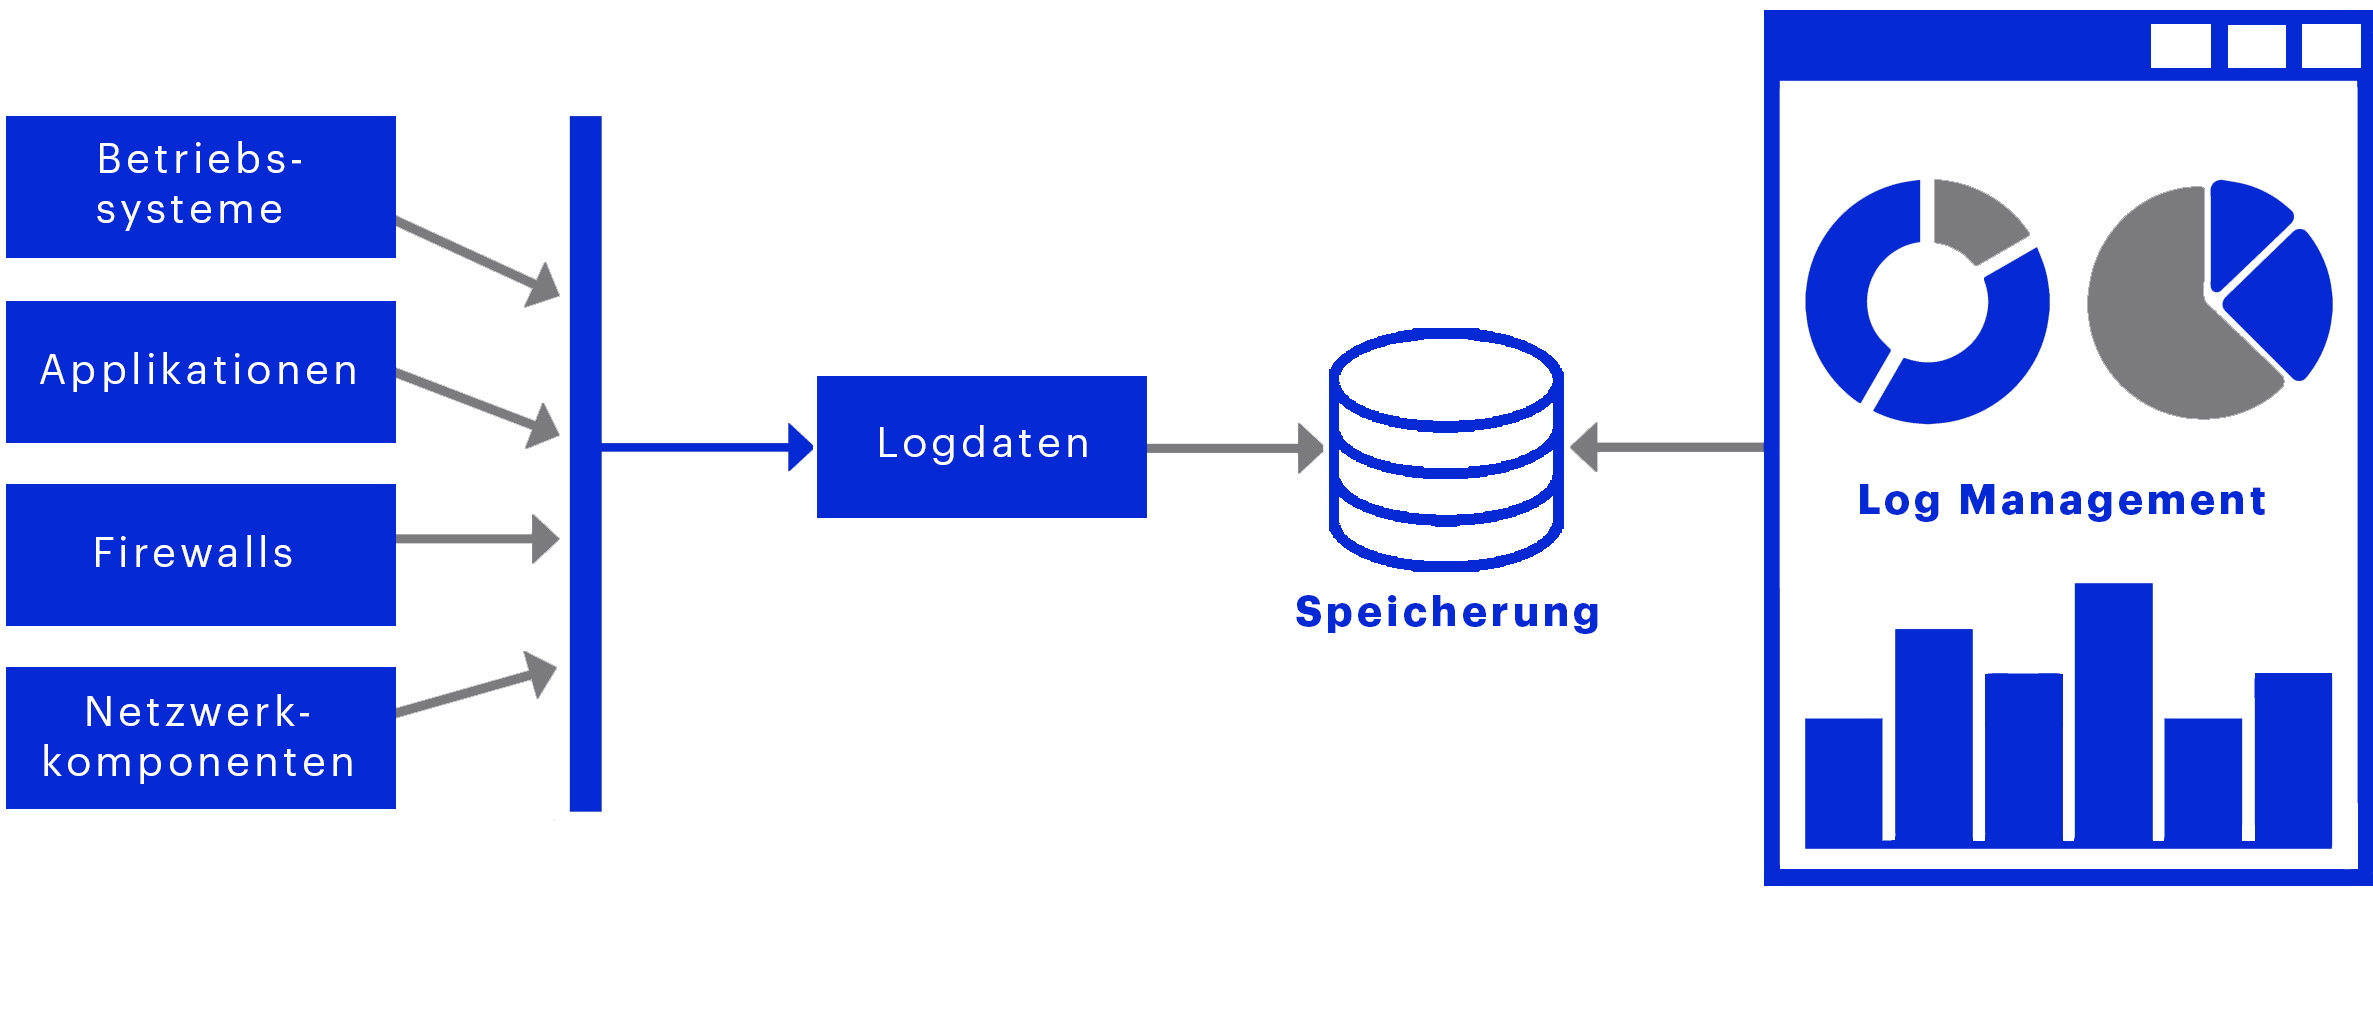 Log Management, Grafik, Logdaten, matrix technology AG